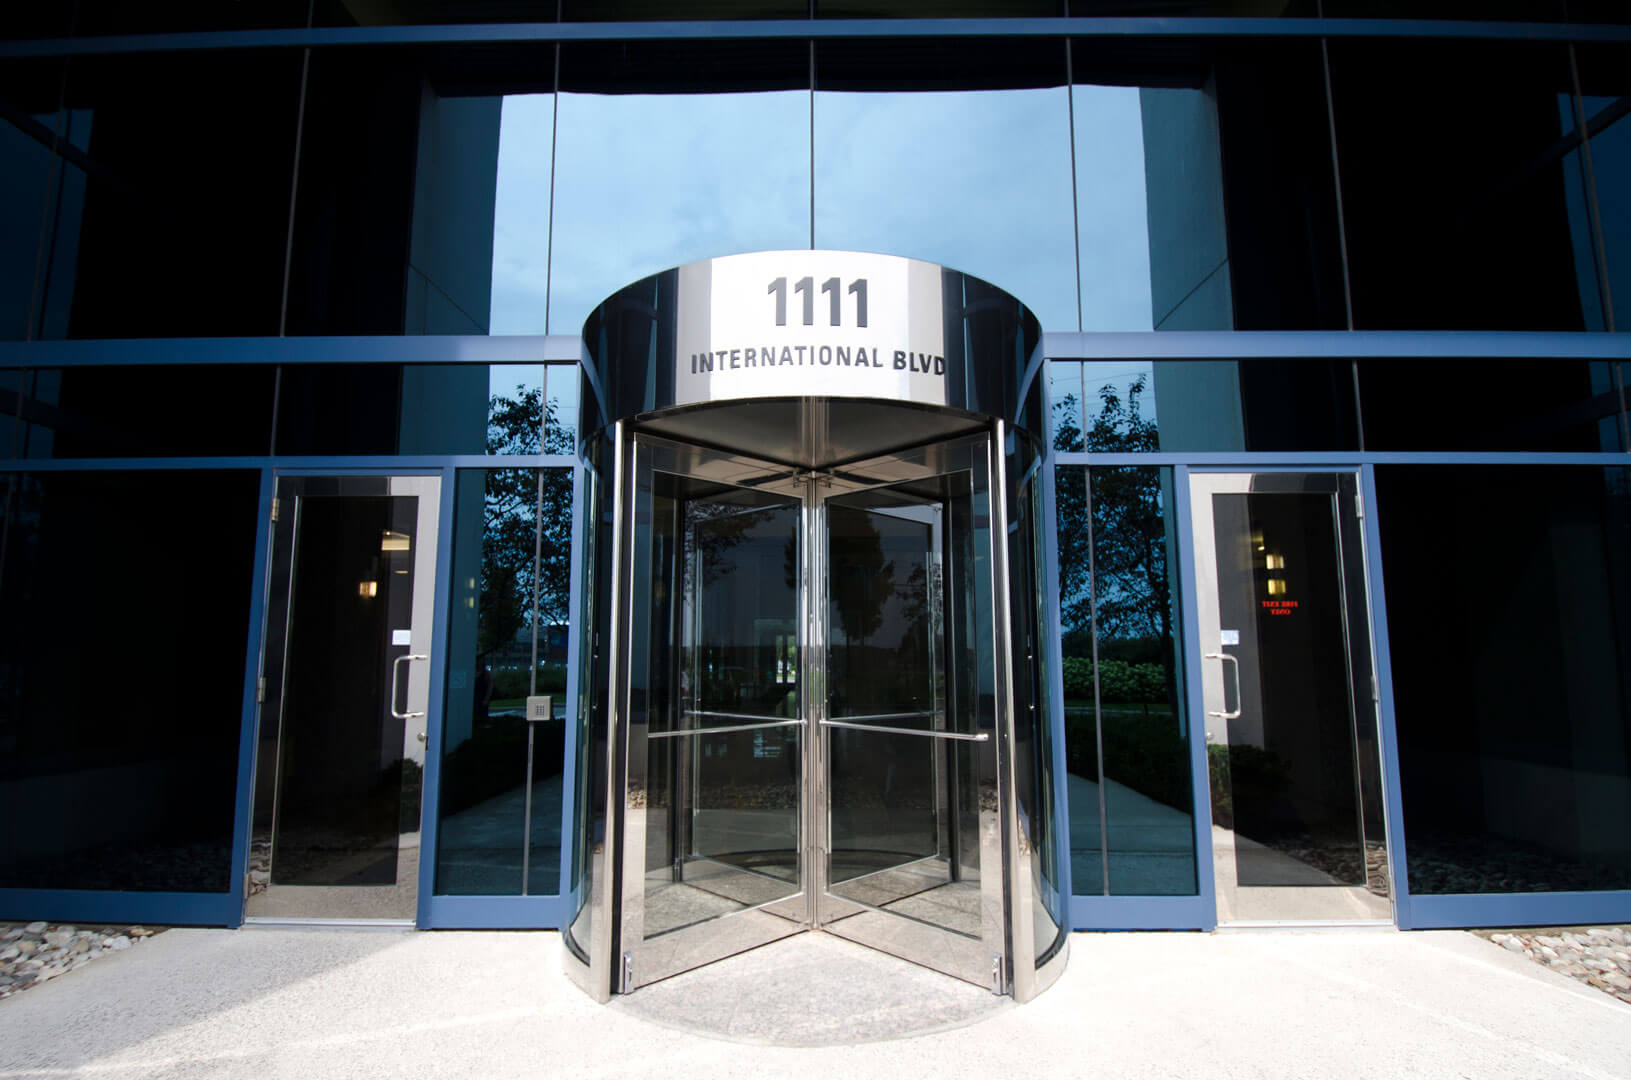 1111 International Blvd - sign